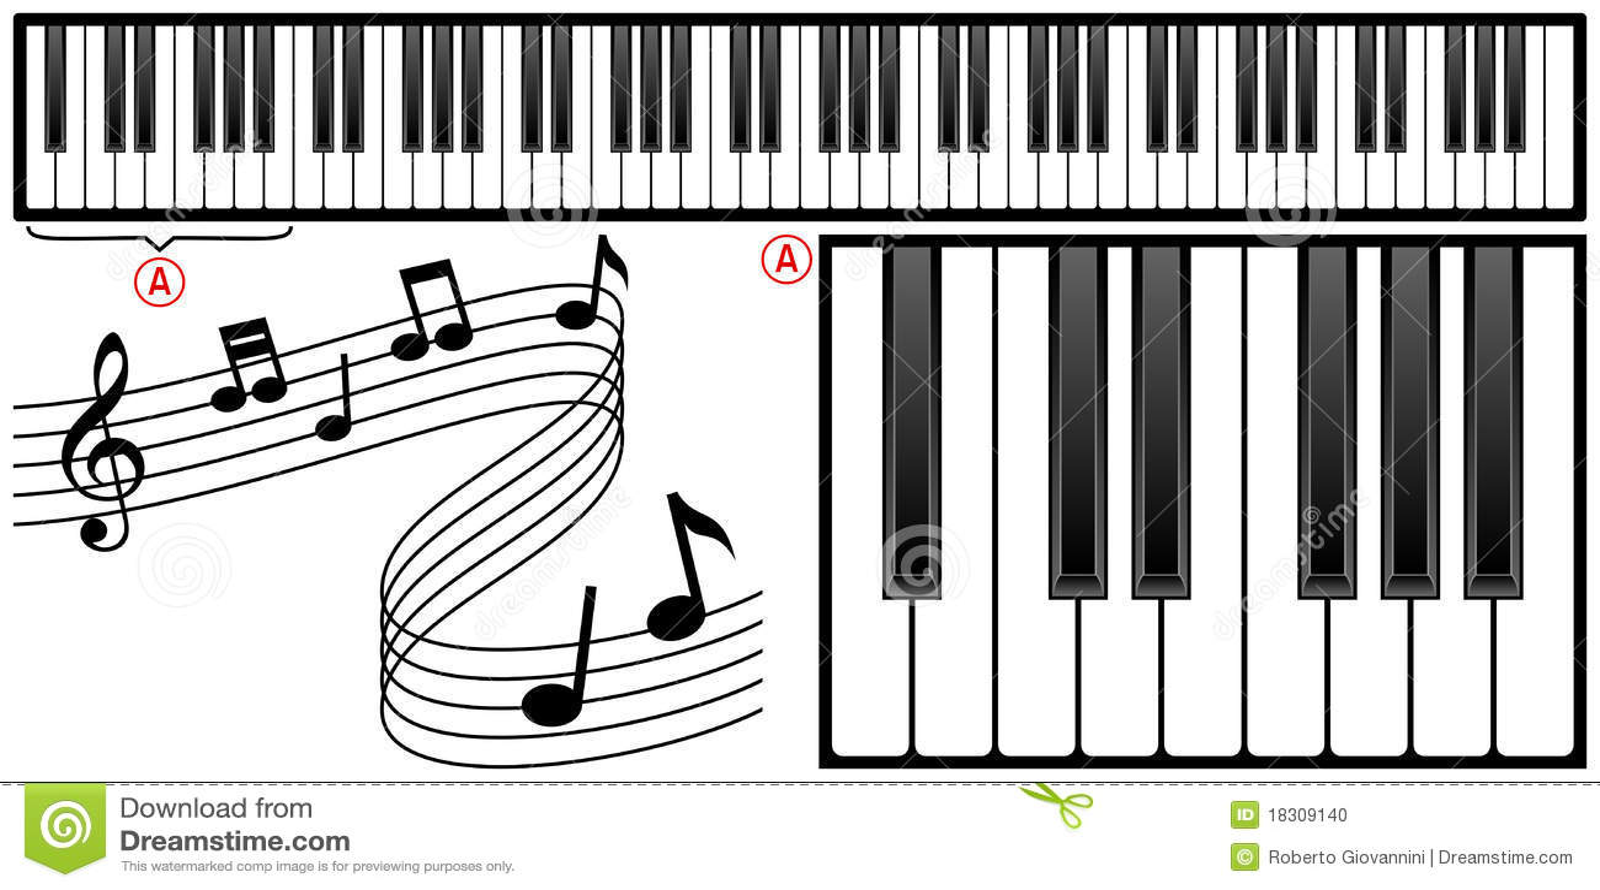 Piano Keyboard stock vector. Image of organ, instrumental